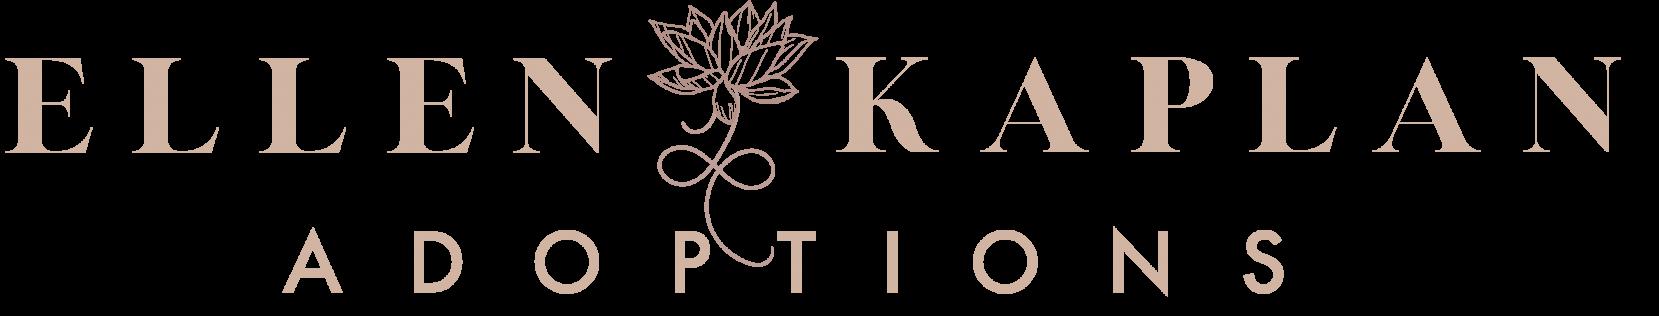 Ellen Kaplan Adoptions